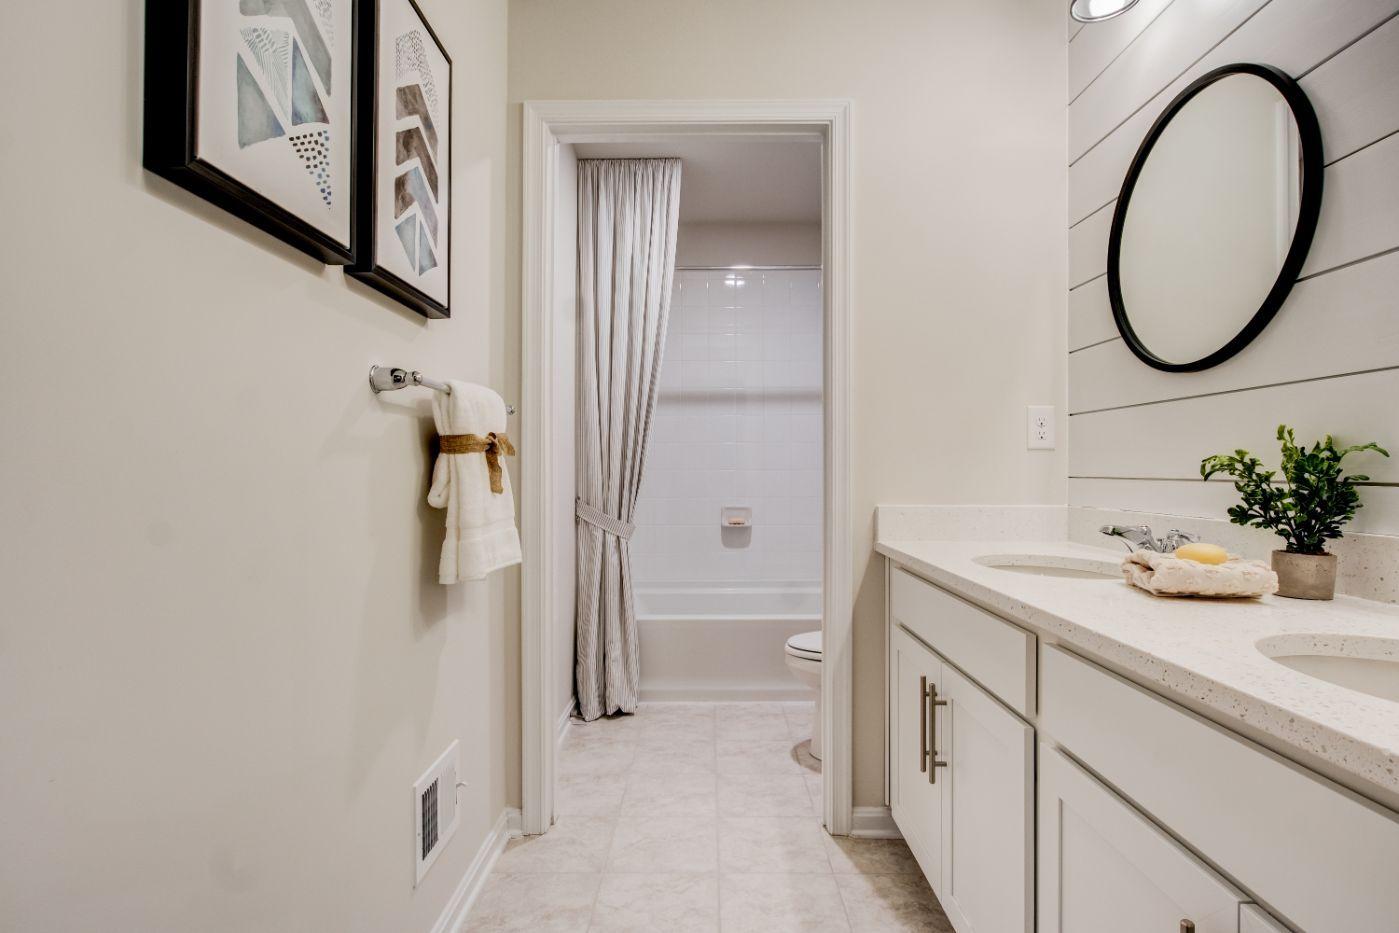 Bathroom featured in the HADLEY By D.R. Horton in Washington, VA